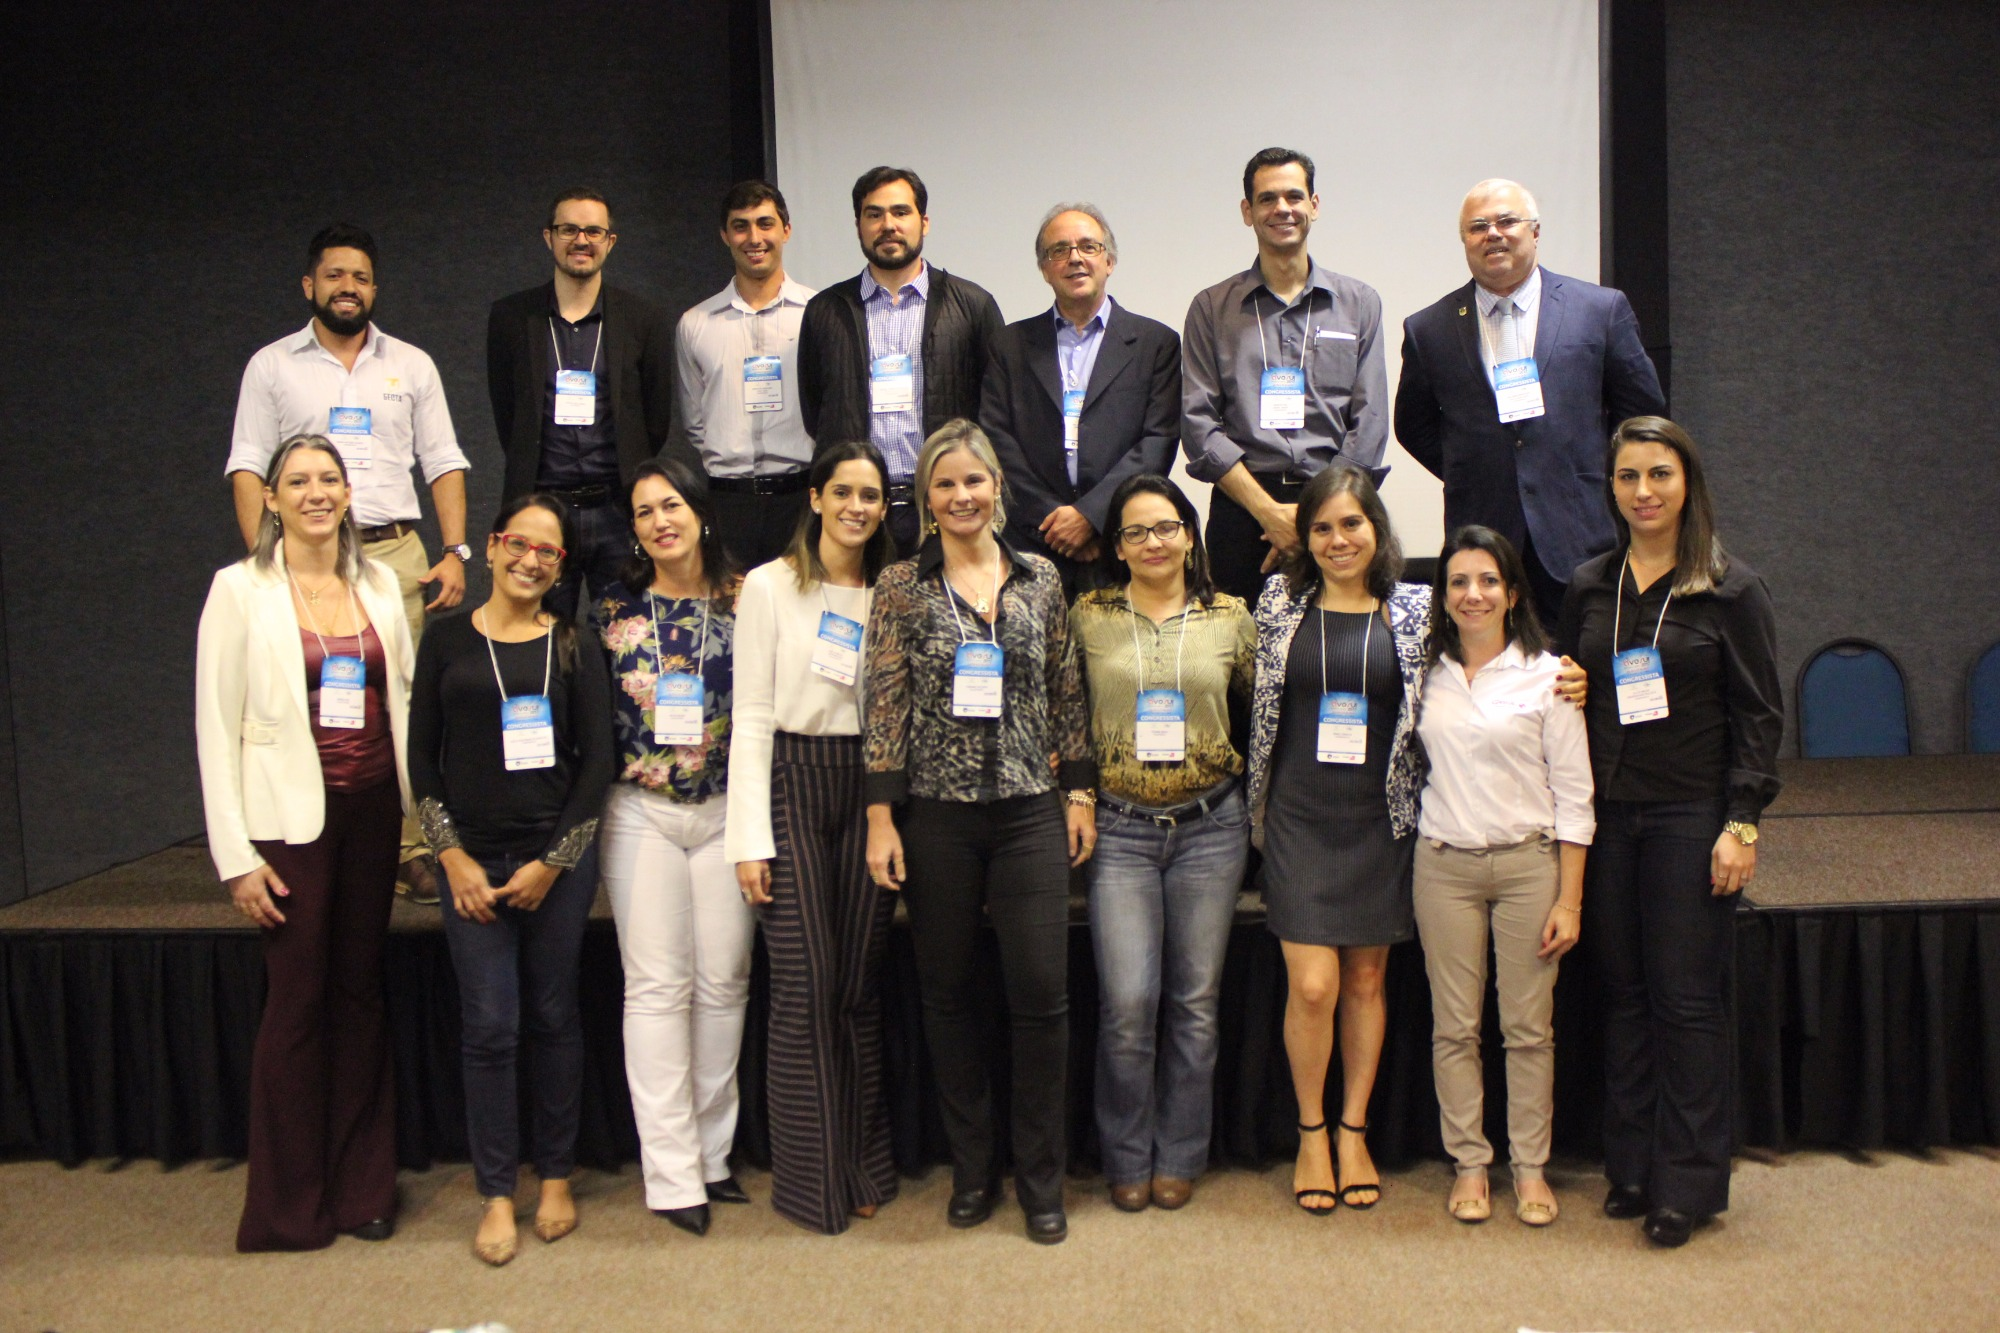 Instituto Oswaldo Gessulli premia trabalhos científicos na AveSui 2017